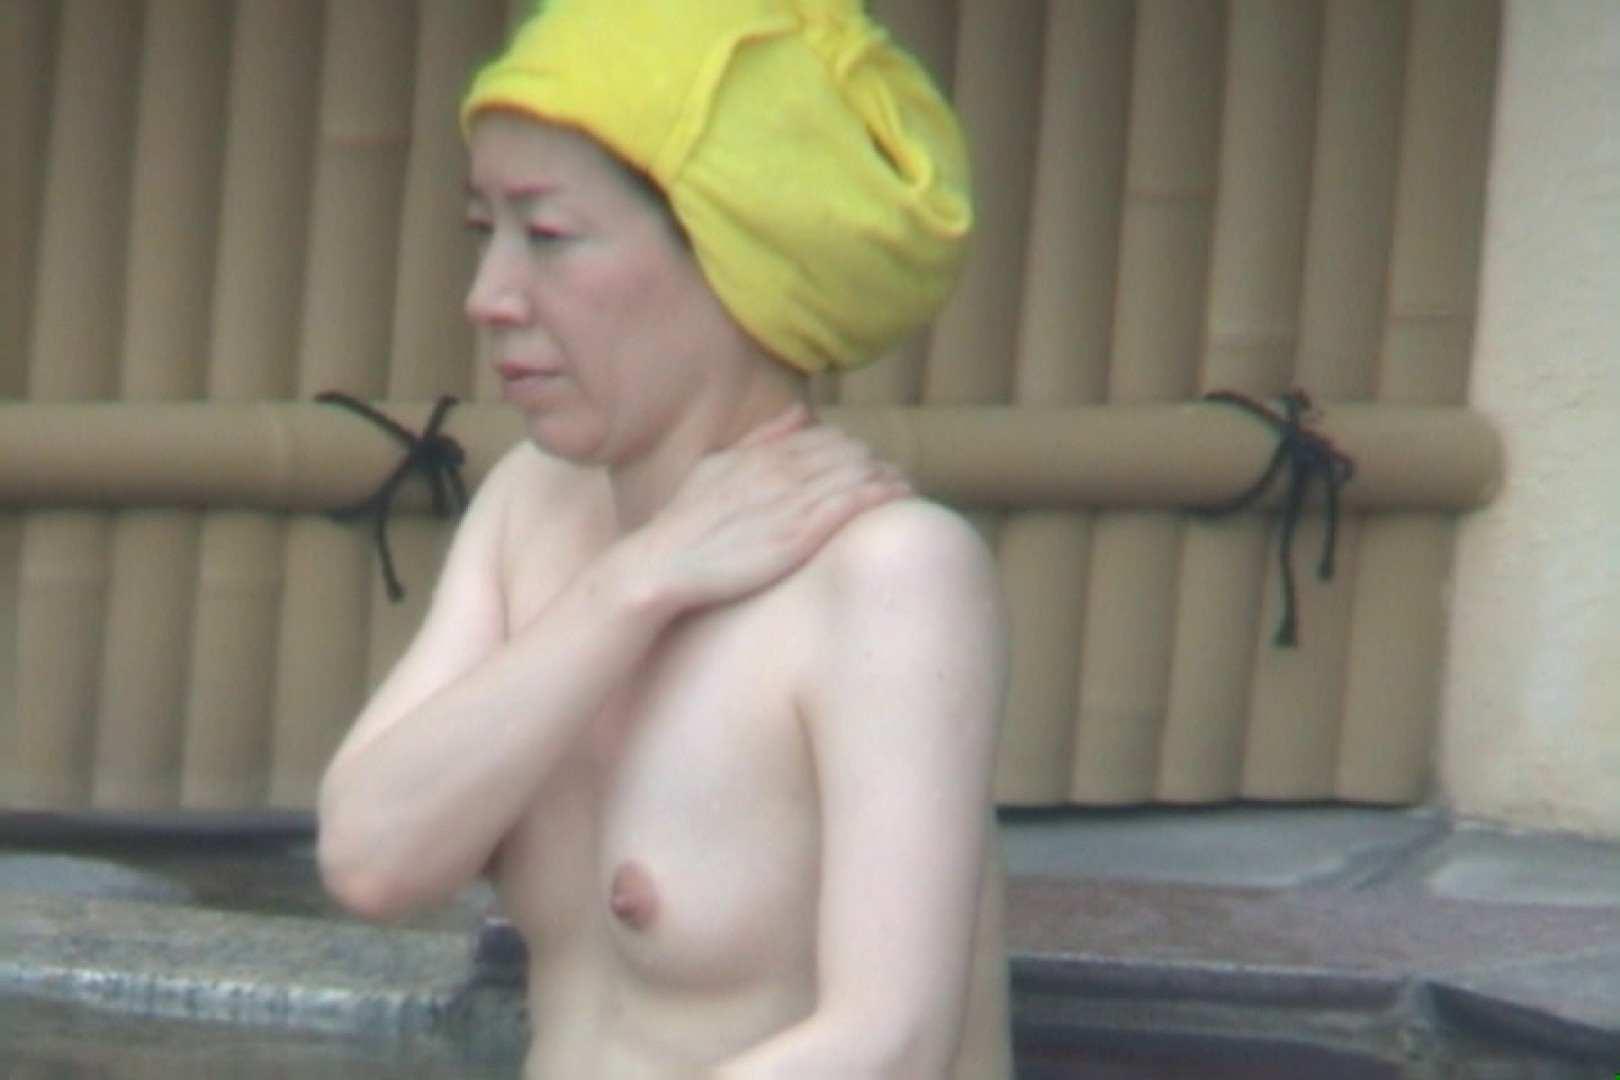 Aquaな露天風呂Vol.569 盗撮シリーズ | 露天風呂編  84PIX 67